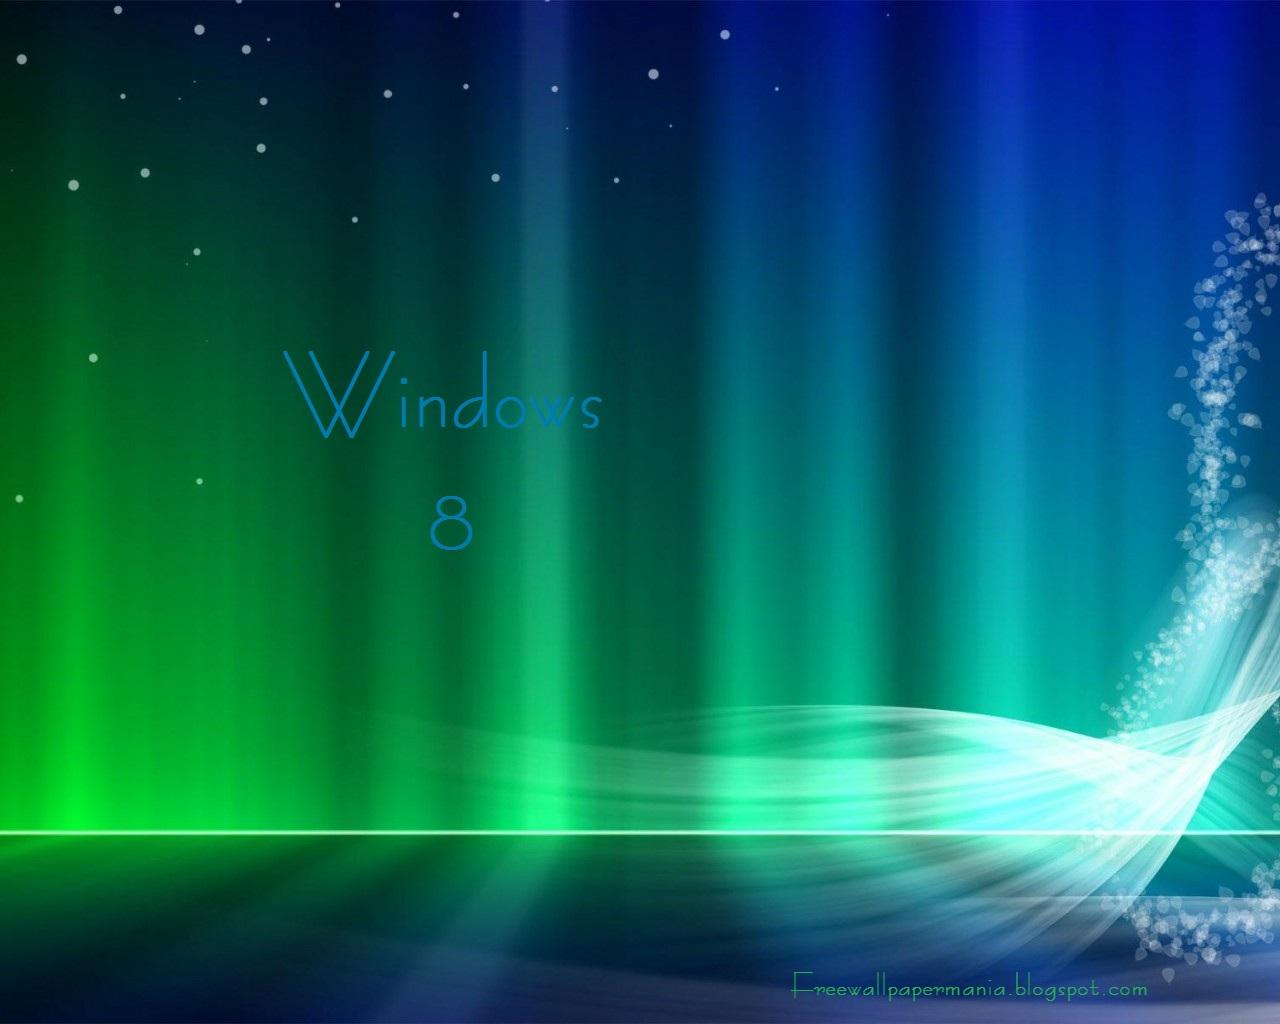 Reparaturdatenträger Windows 8